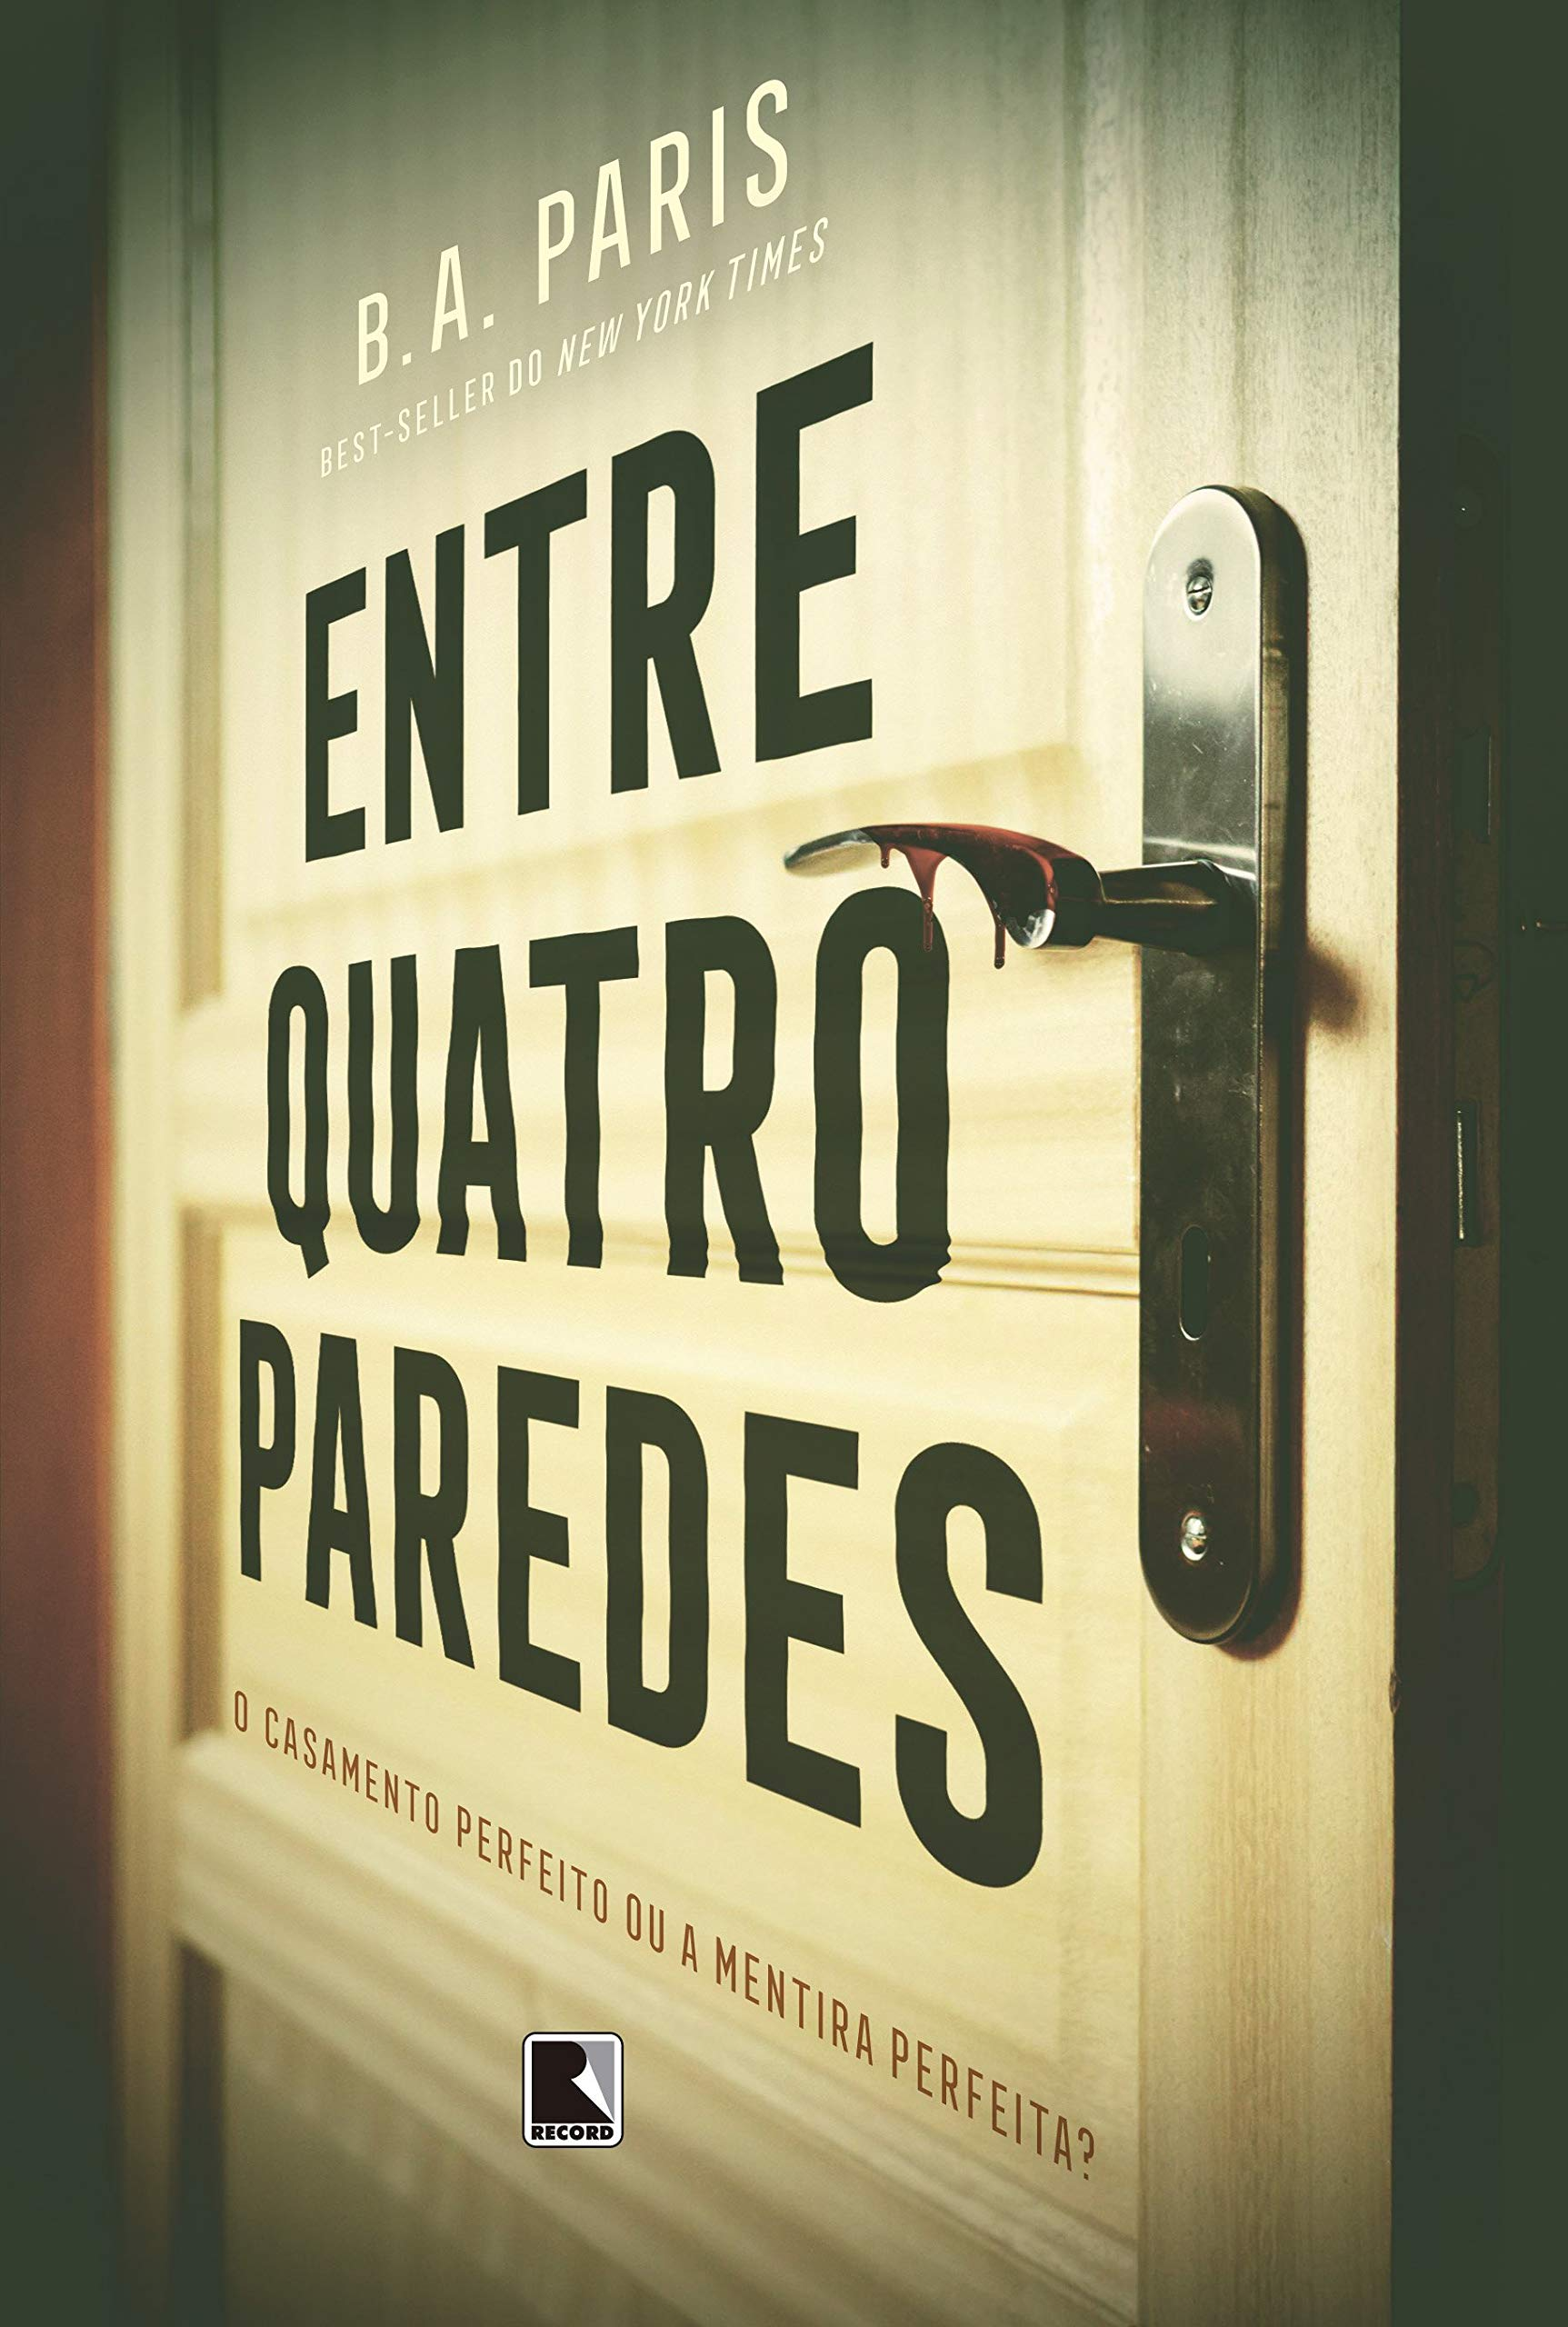 Entre quatro paredes - 9788501109606 - Livros na Amazon Brasil